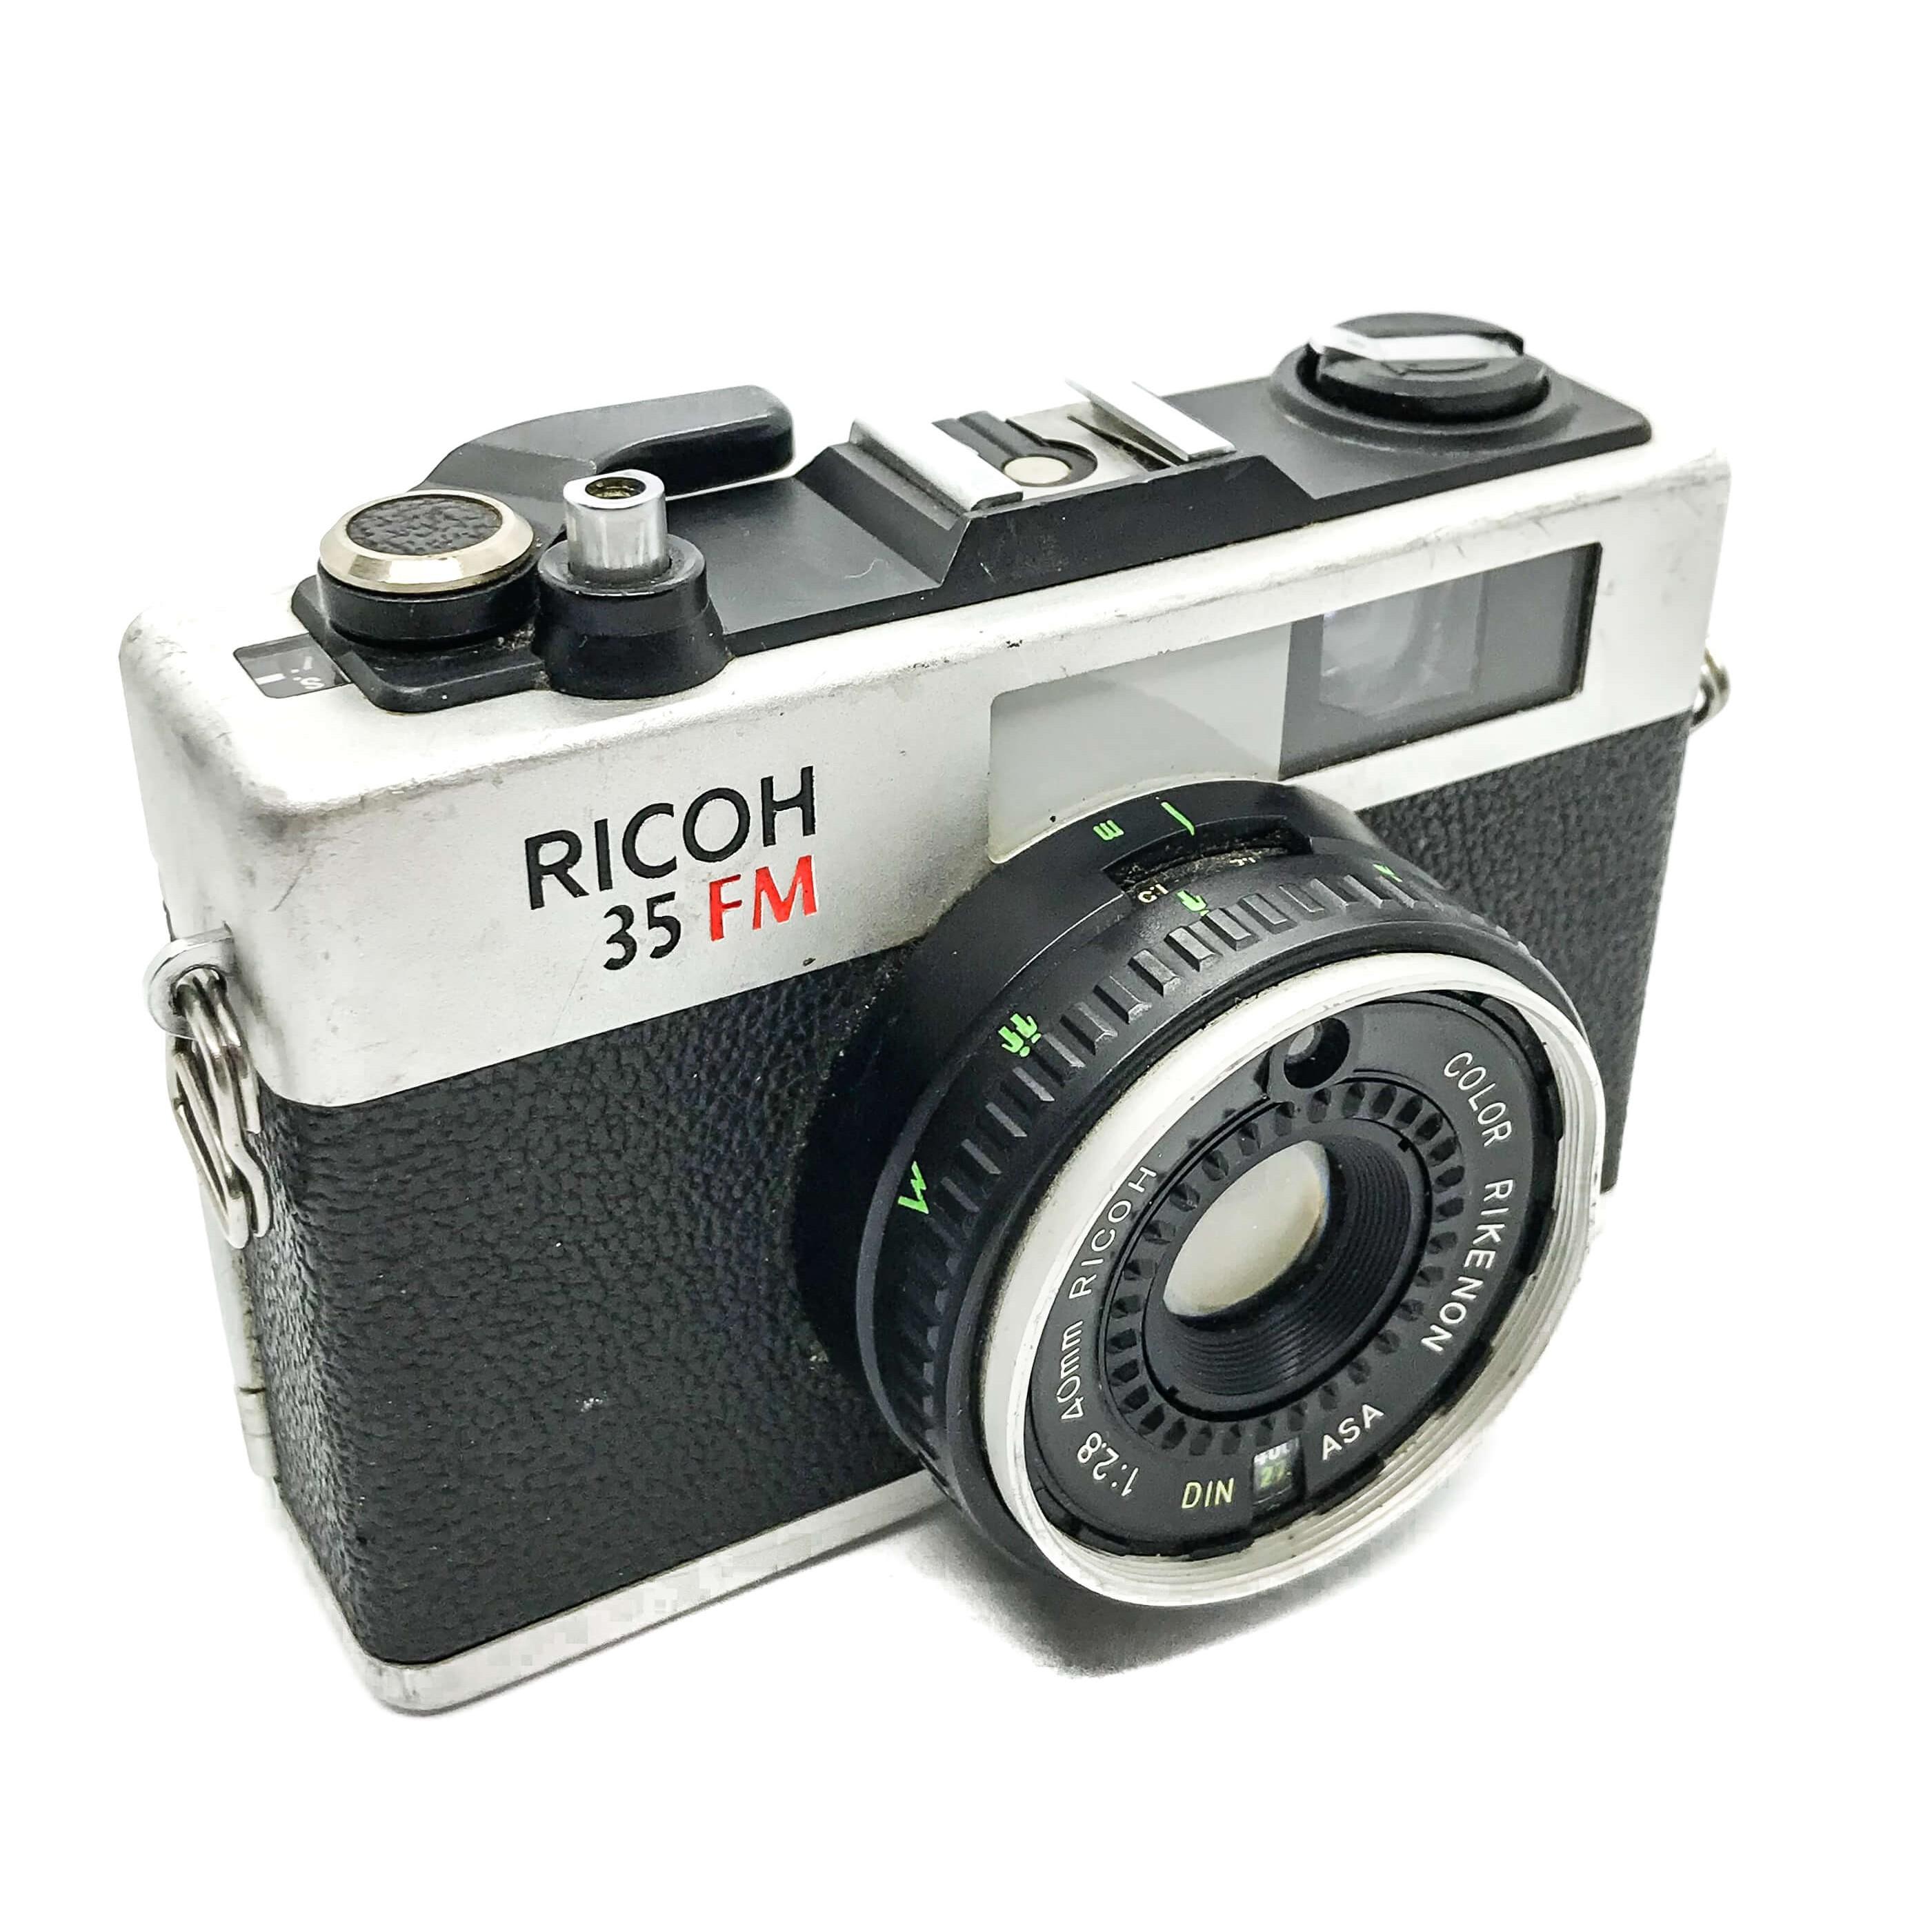 Richoh 35mm camera on white background